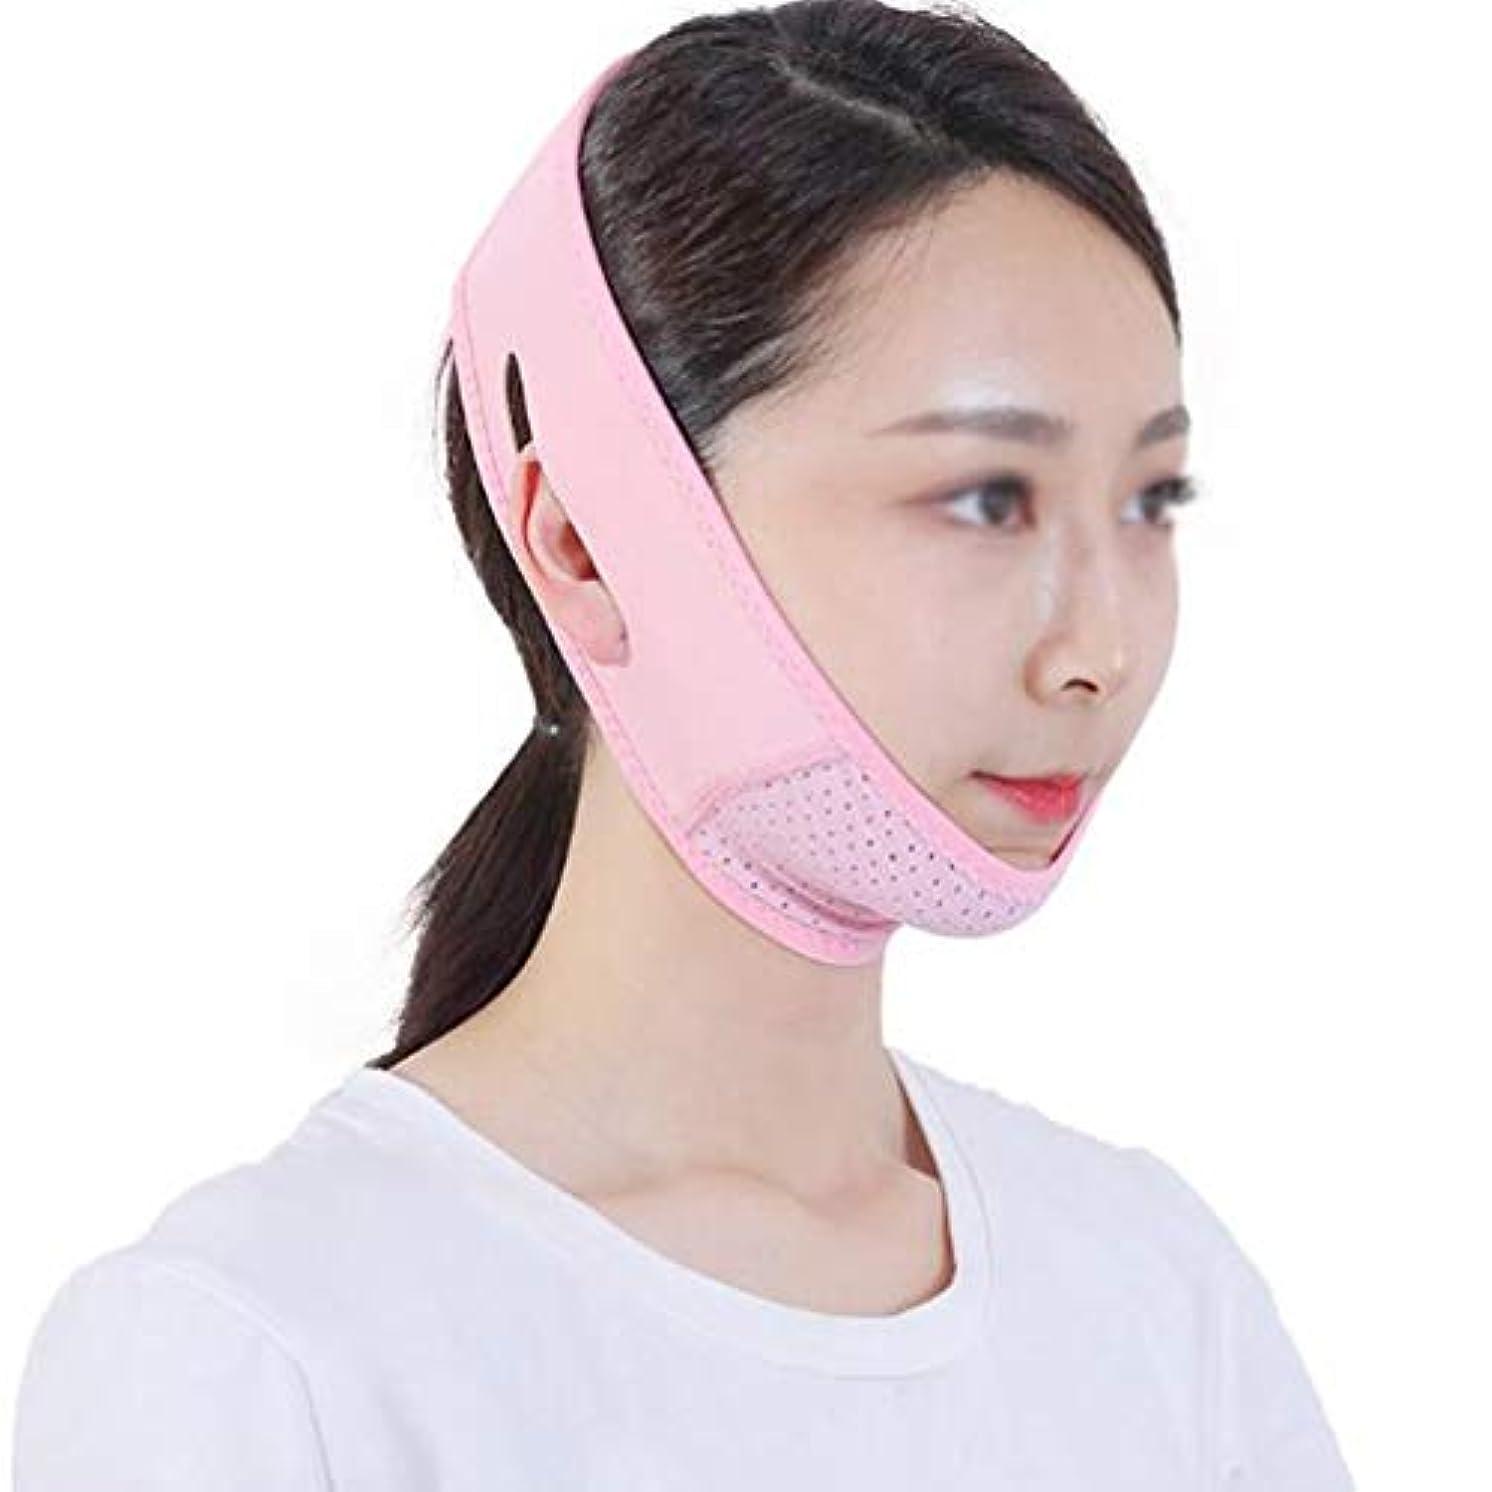 Heallily フェイスリフティングVバンドフェイスシェイパー無料あご頬リフトアップバンドフェイシャルslim身包帯